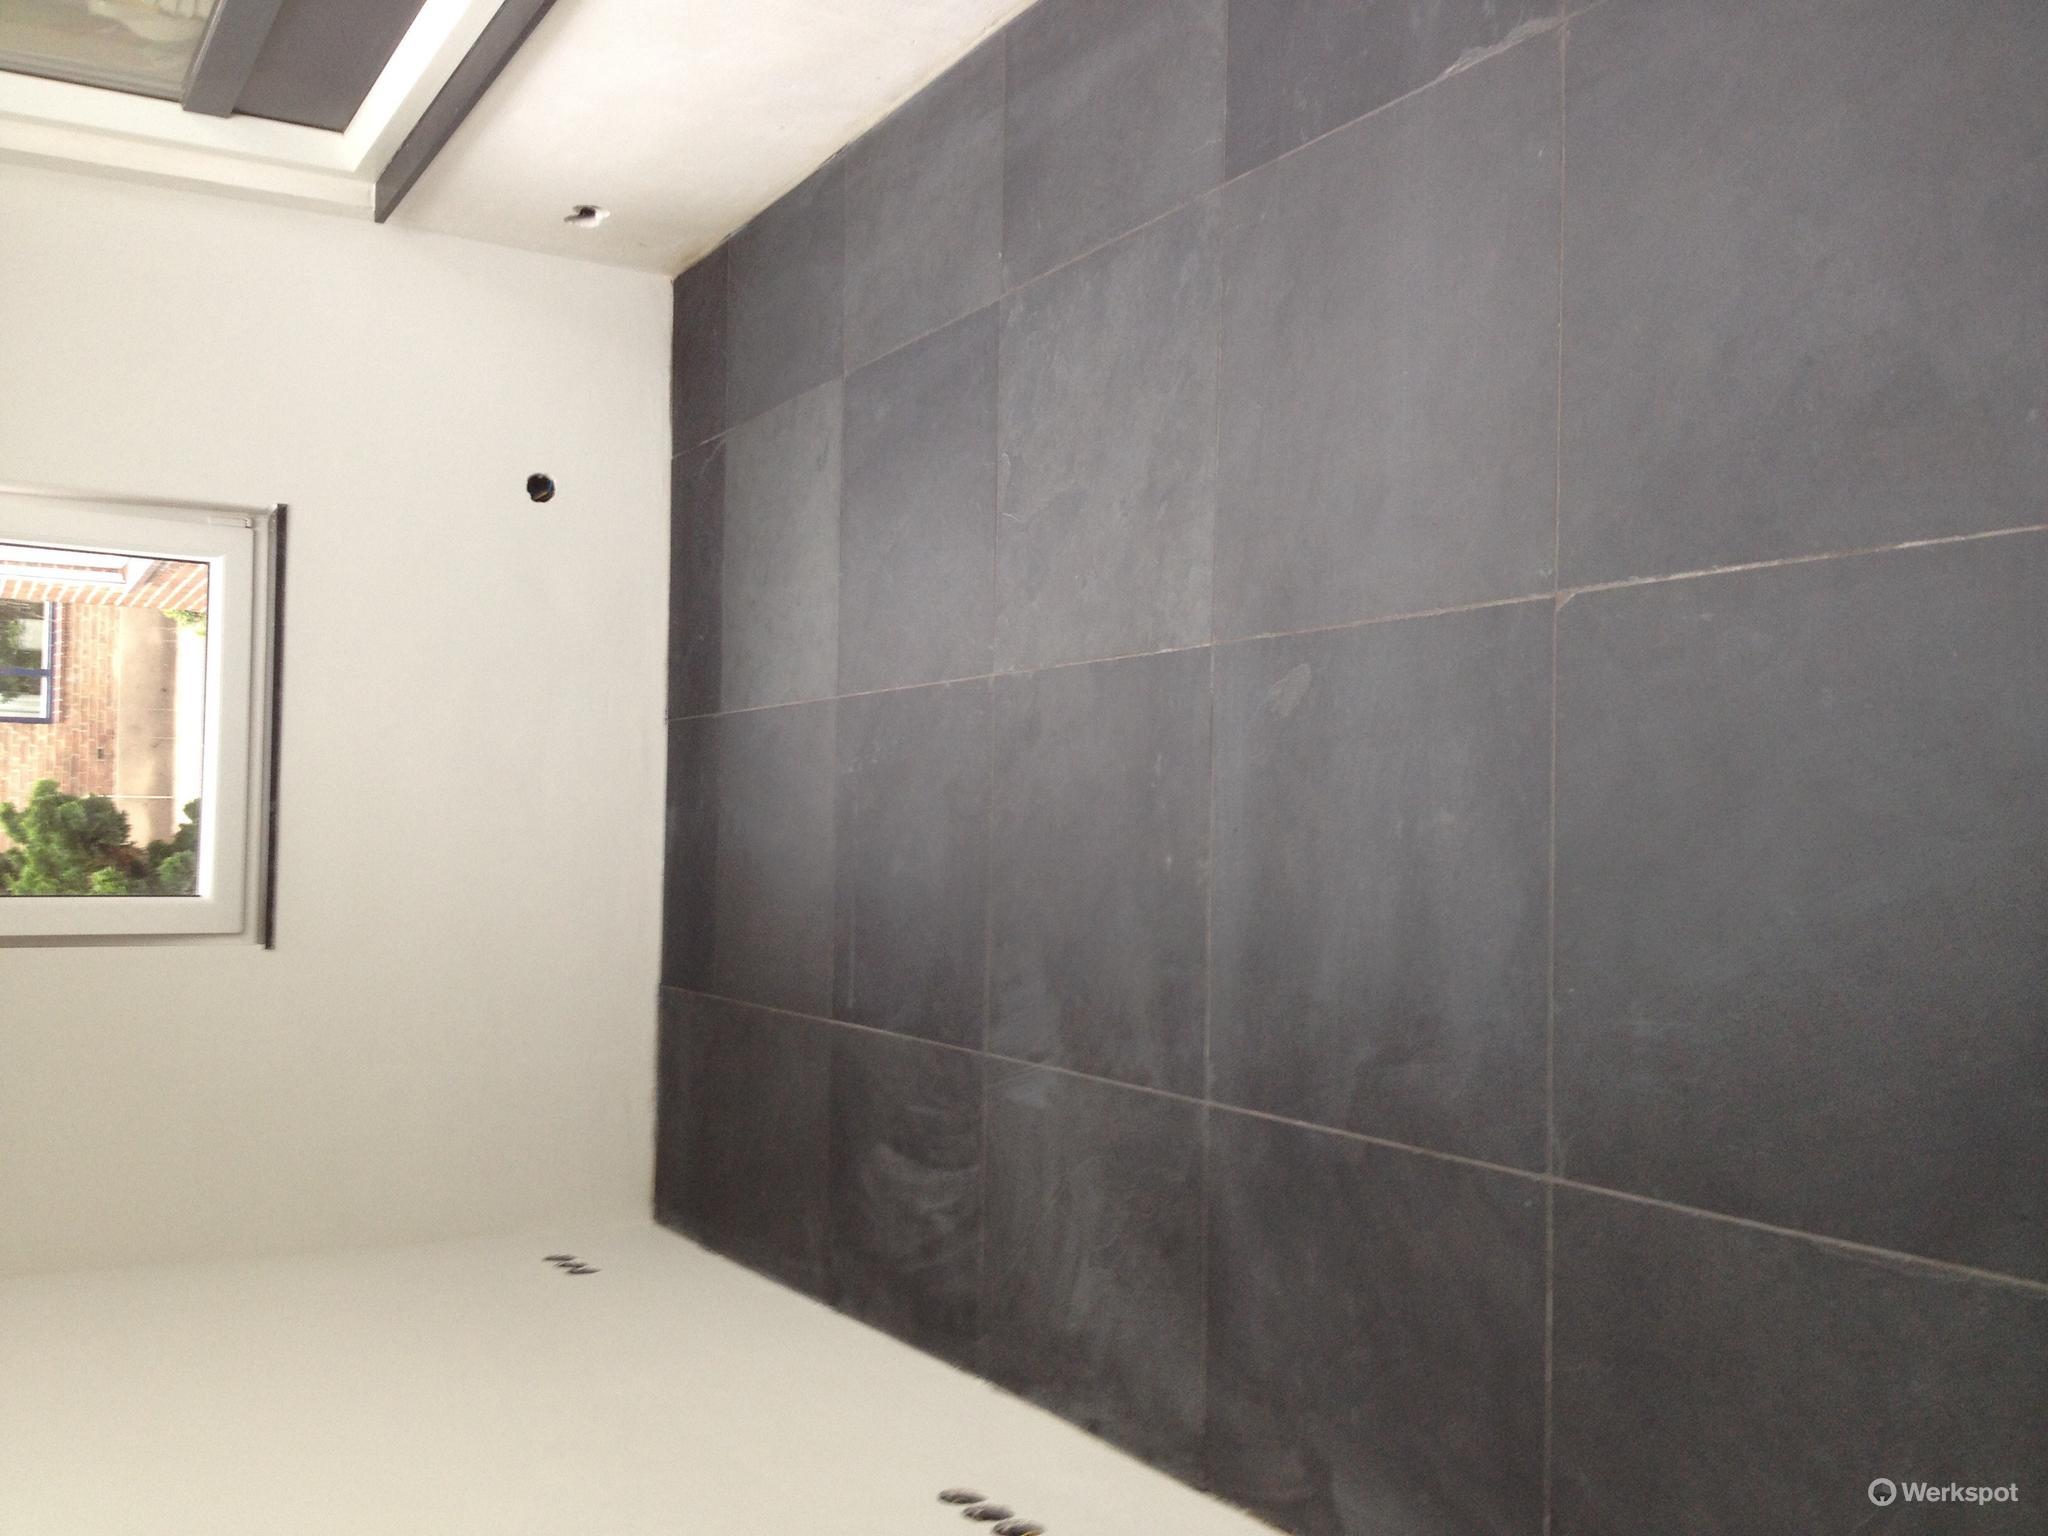 Egaliseren Over Tegels : Vloer egaliseren op beton en lei tegels plaatsen werkspot